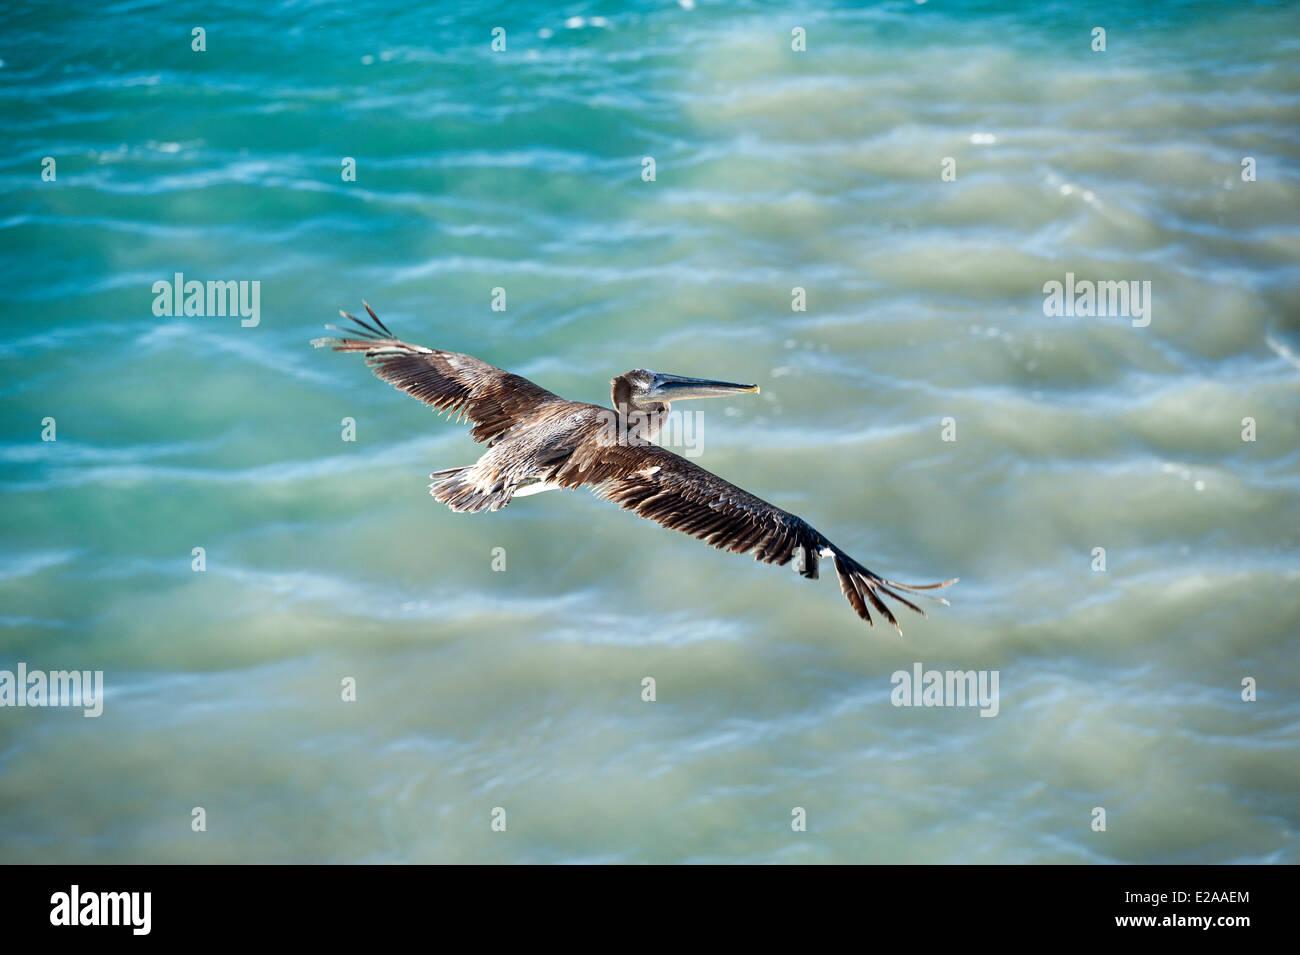 Mexico, Baja California Sur state, pelican - Stock Image